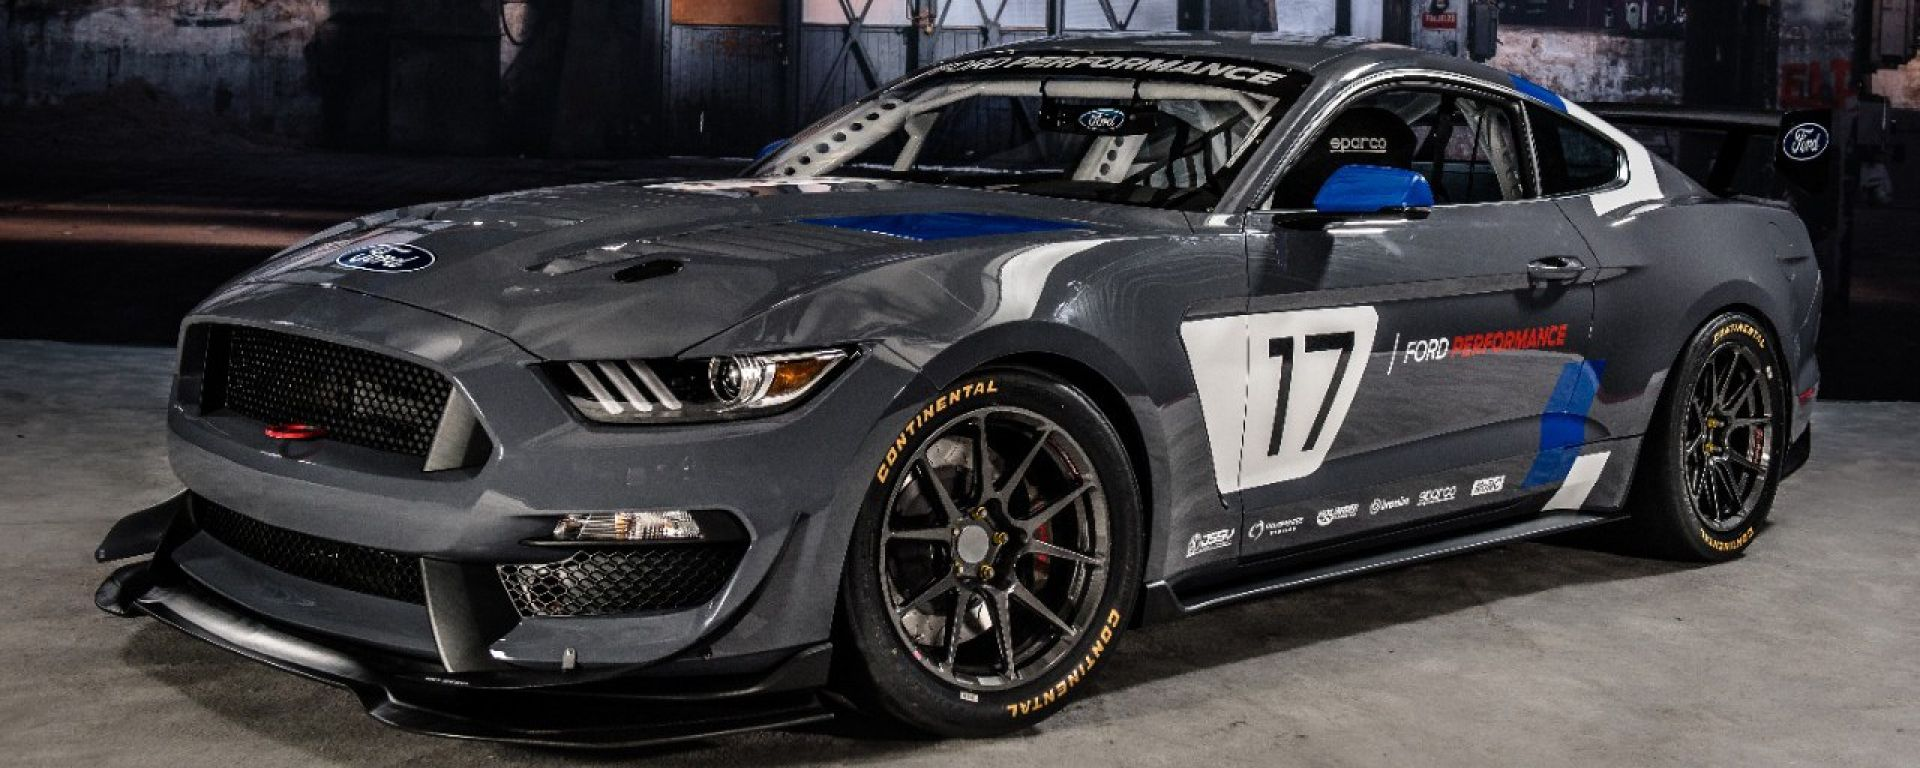 Ford Mustang GT4, debutto al SEMA 2016